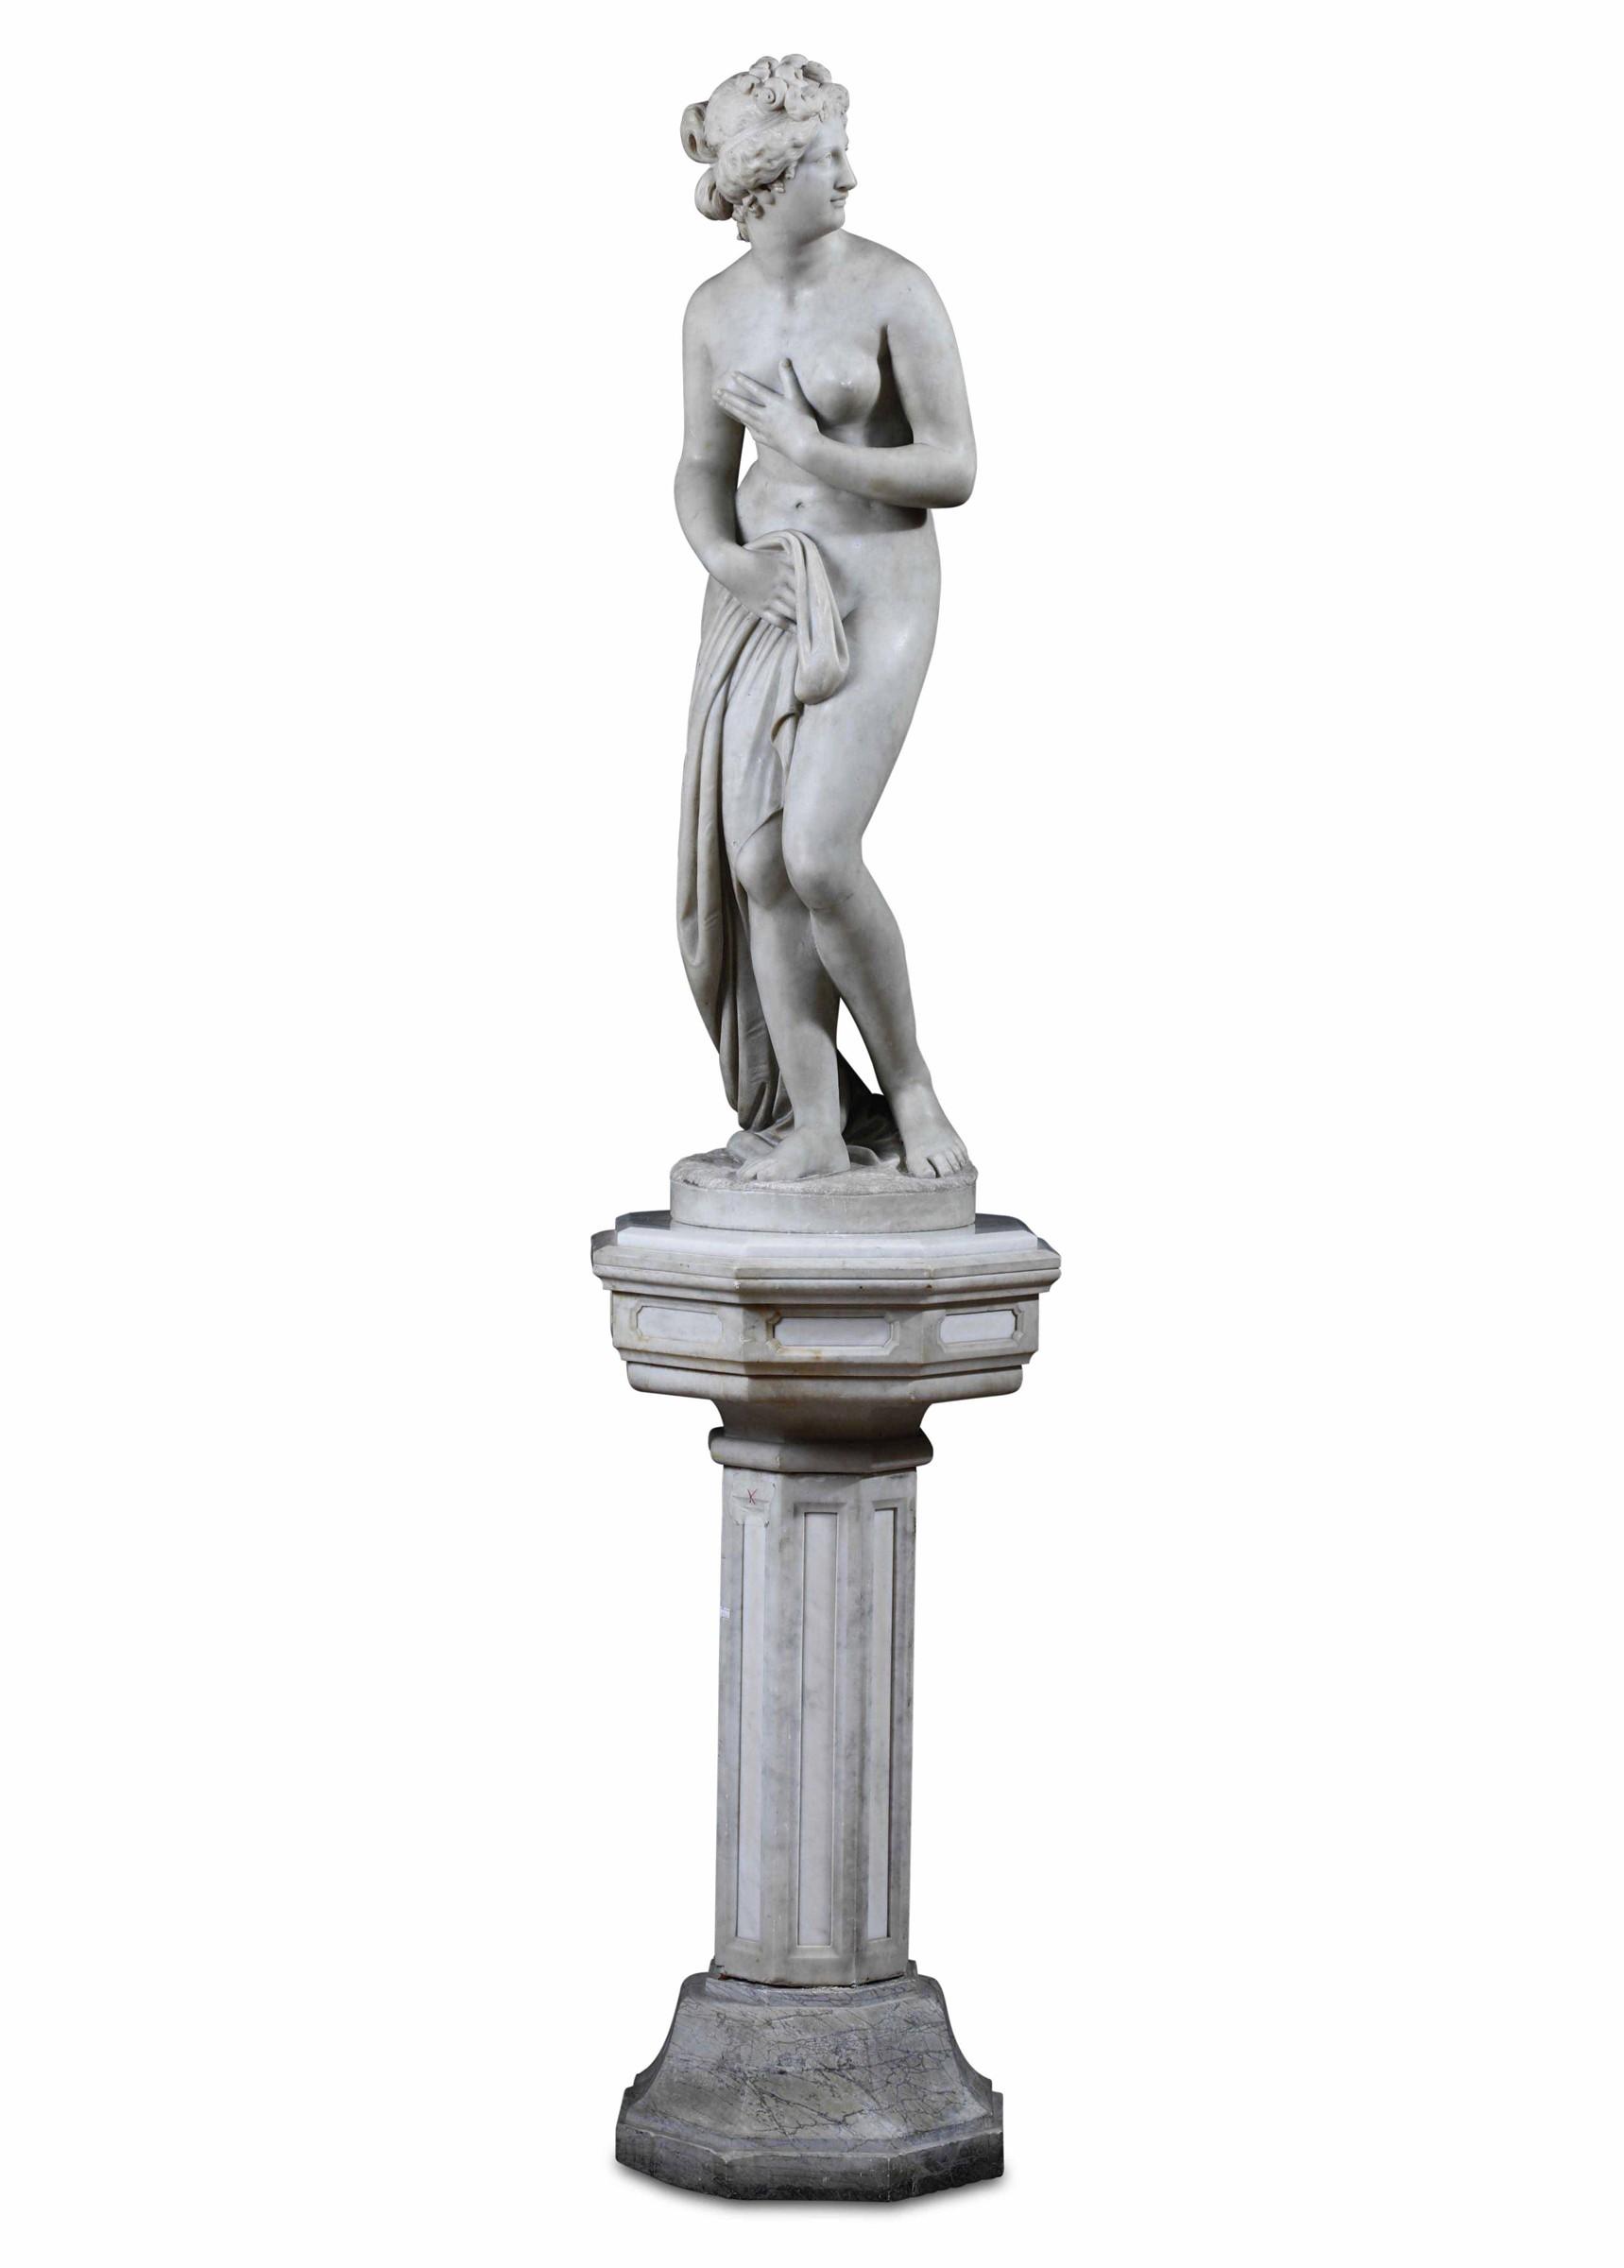 A marble Venus, model by Canova, Italy, 18-1900s - altezza statua cm 122, base cm 100 [...] - Image 3 of 3